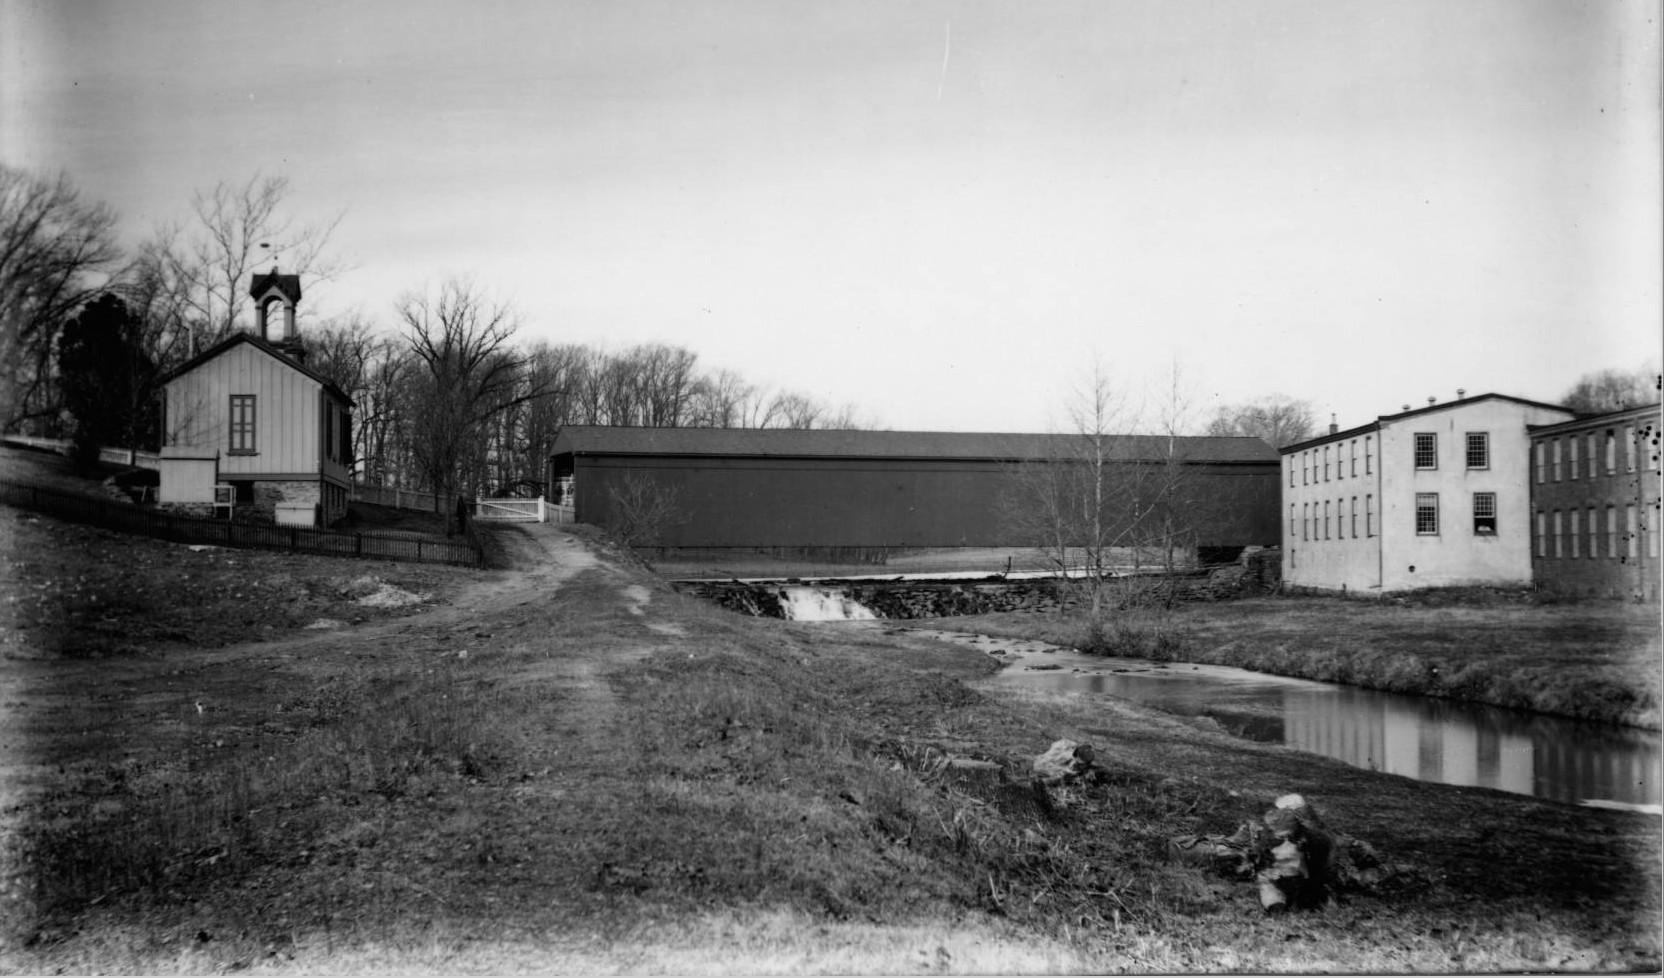 Tabor Covered Bridge